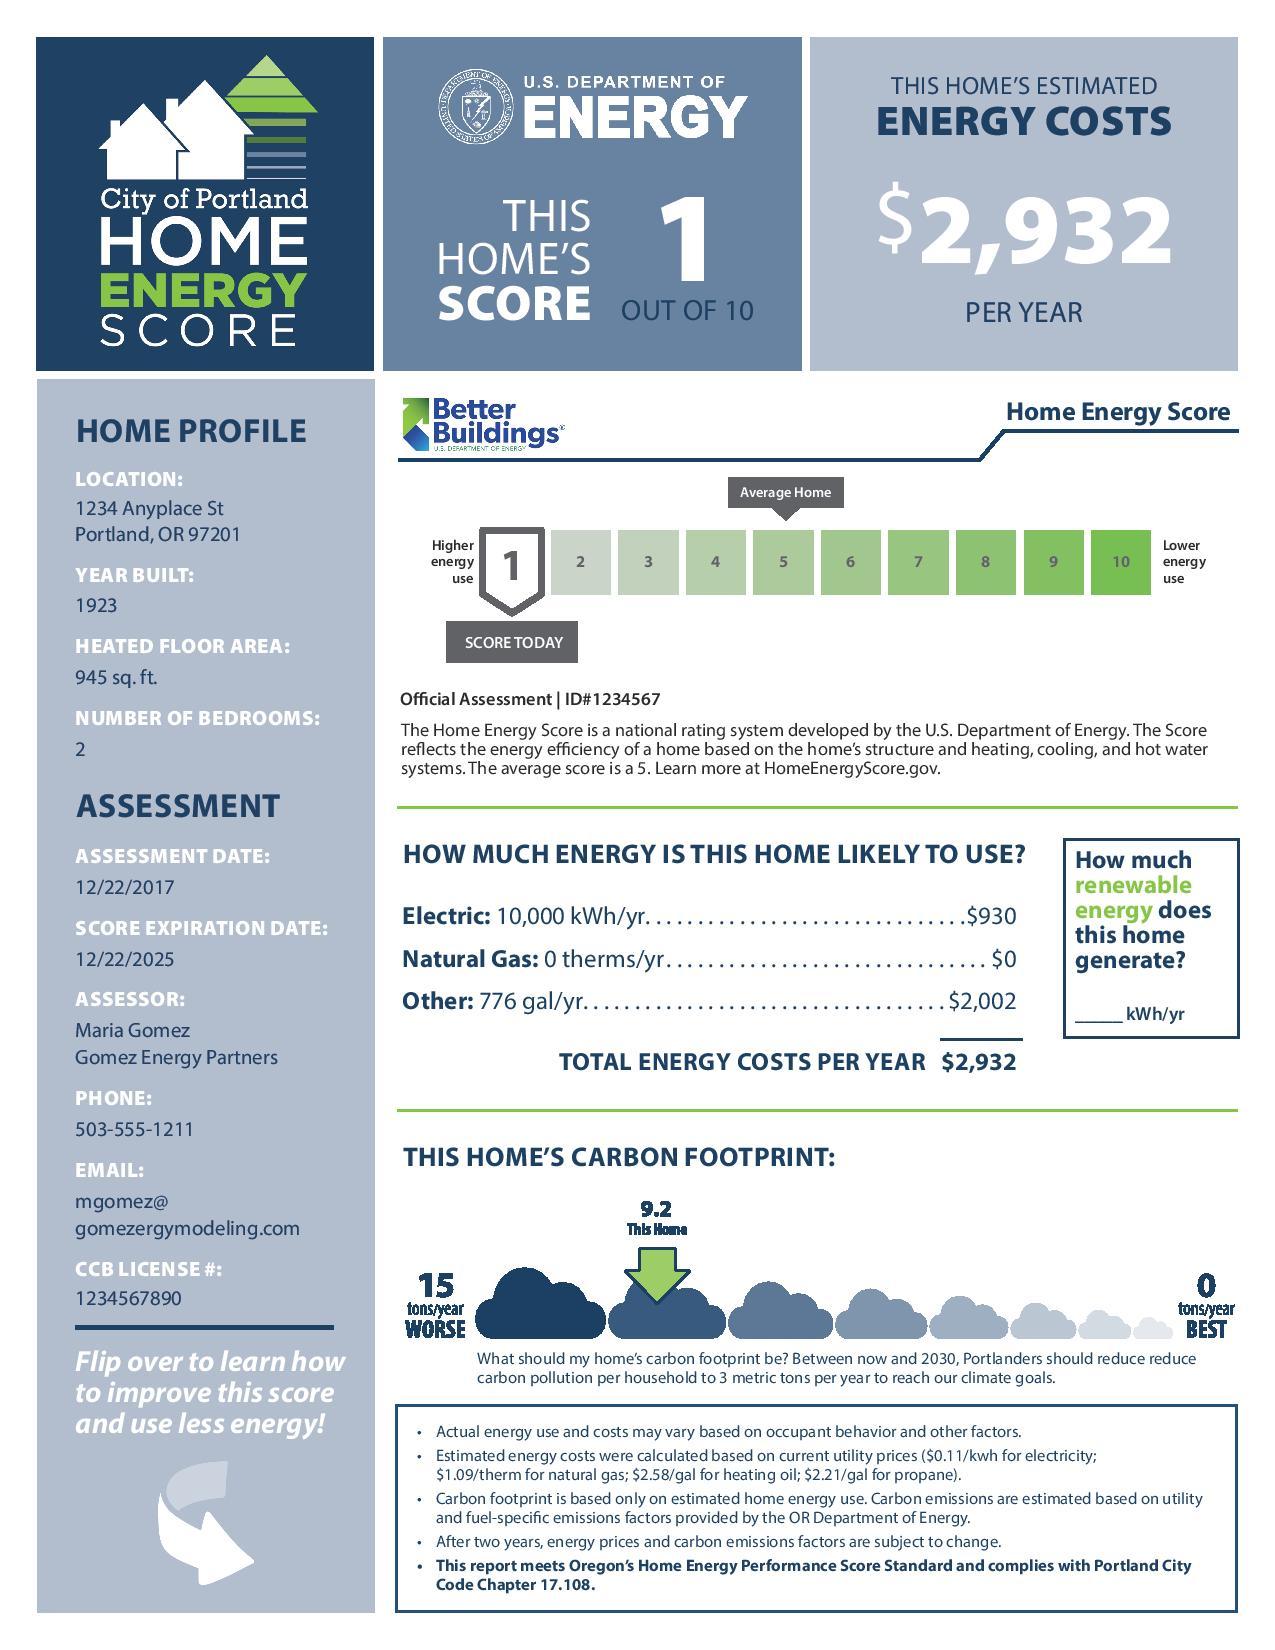 Sample Portland Home Energy Report-v2-171120-page-001.jpg